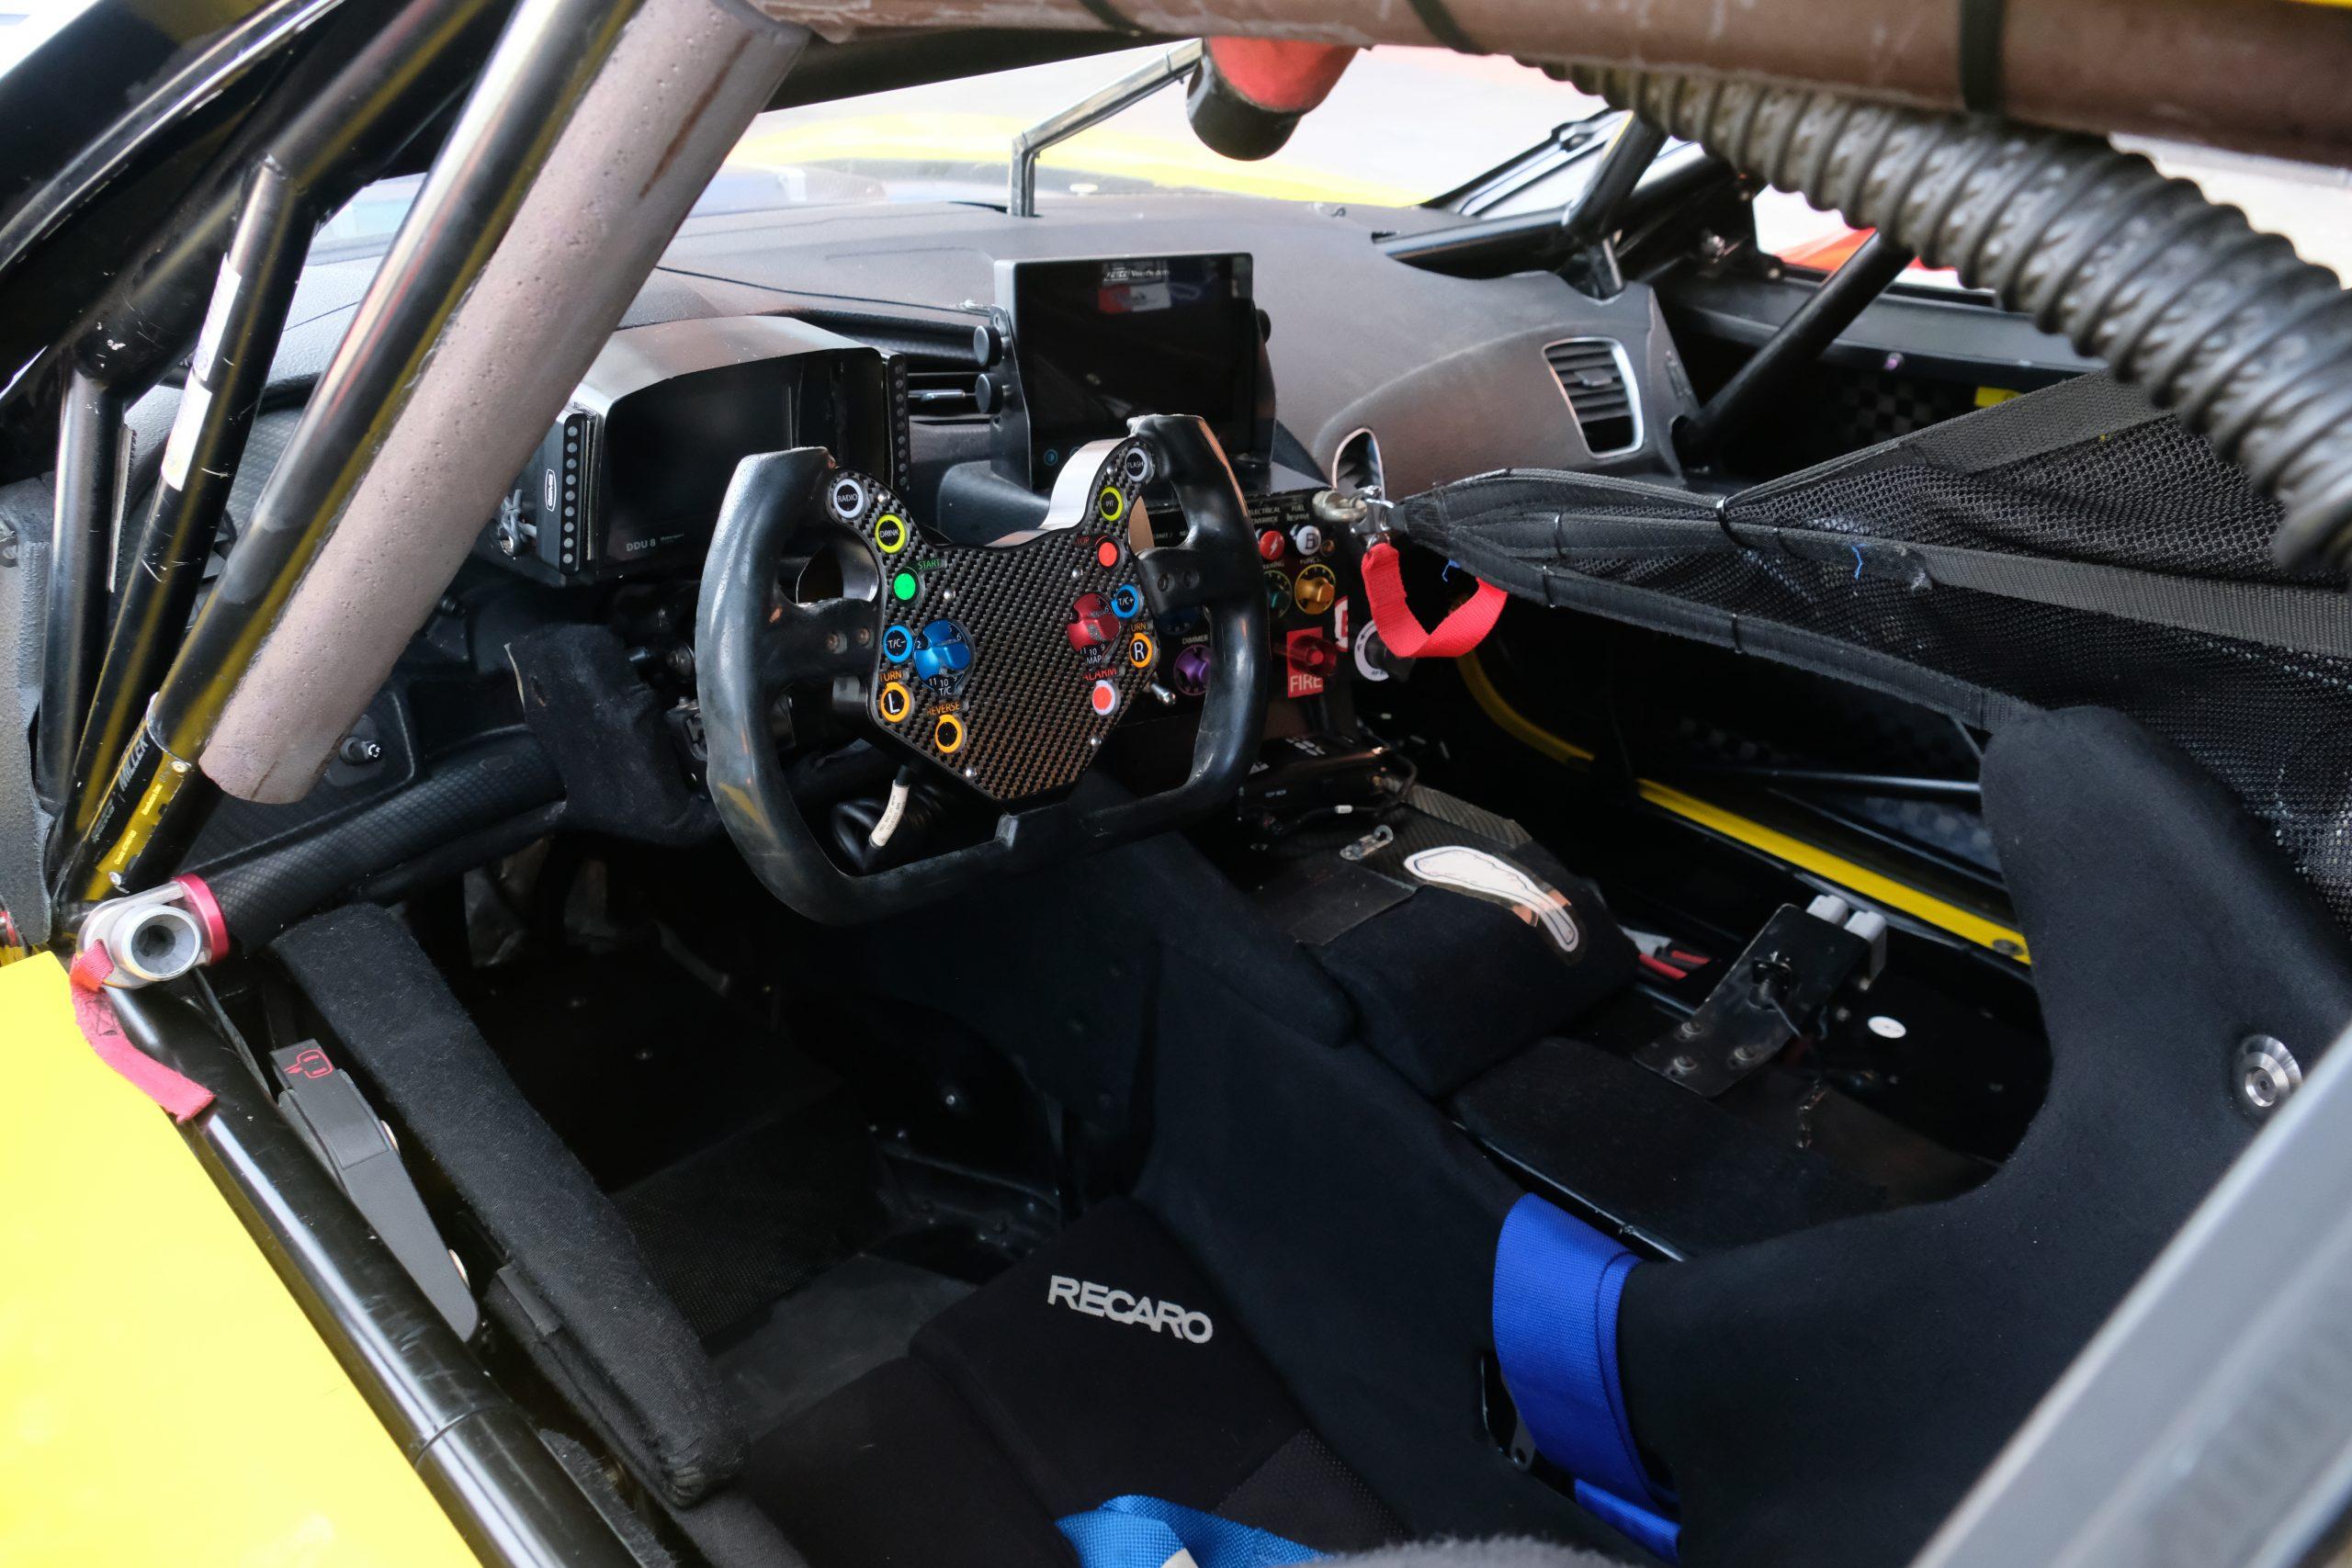 2015 corvette c7.r interior drivers cockpit